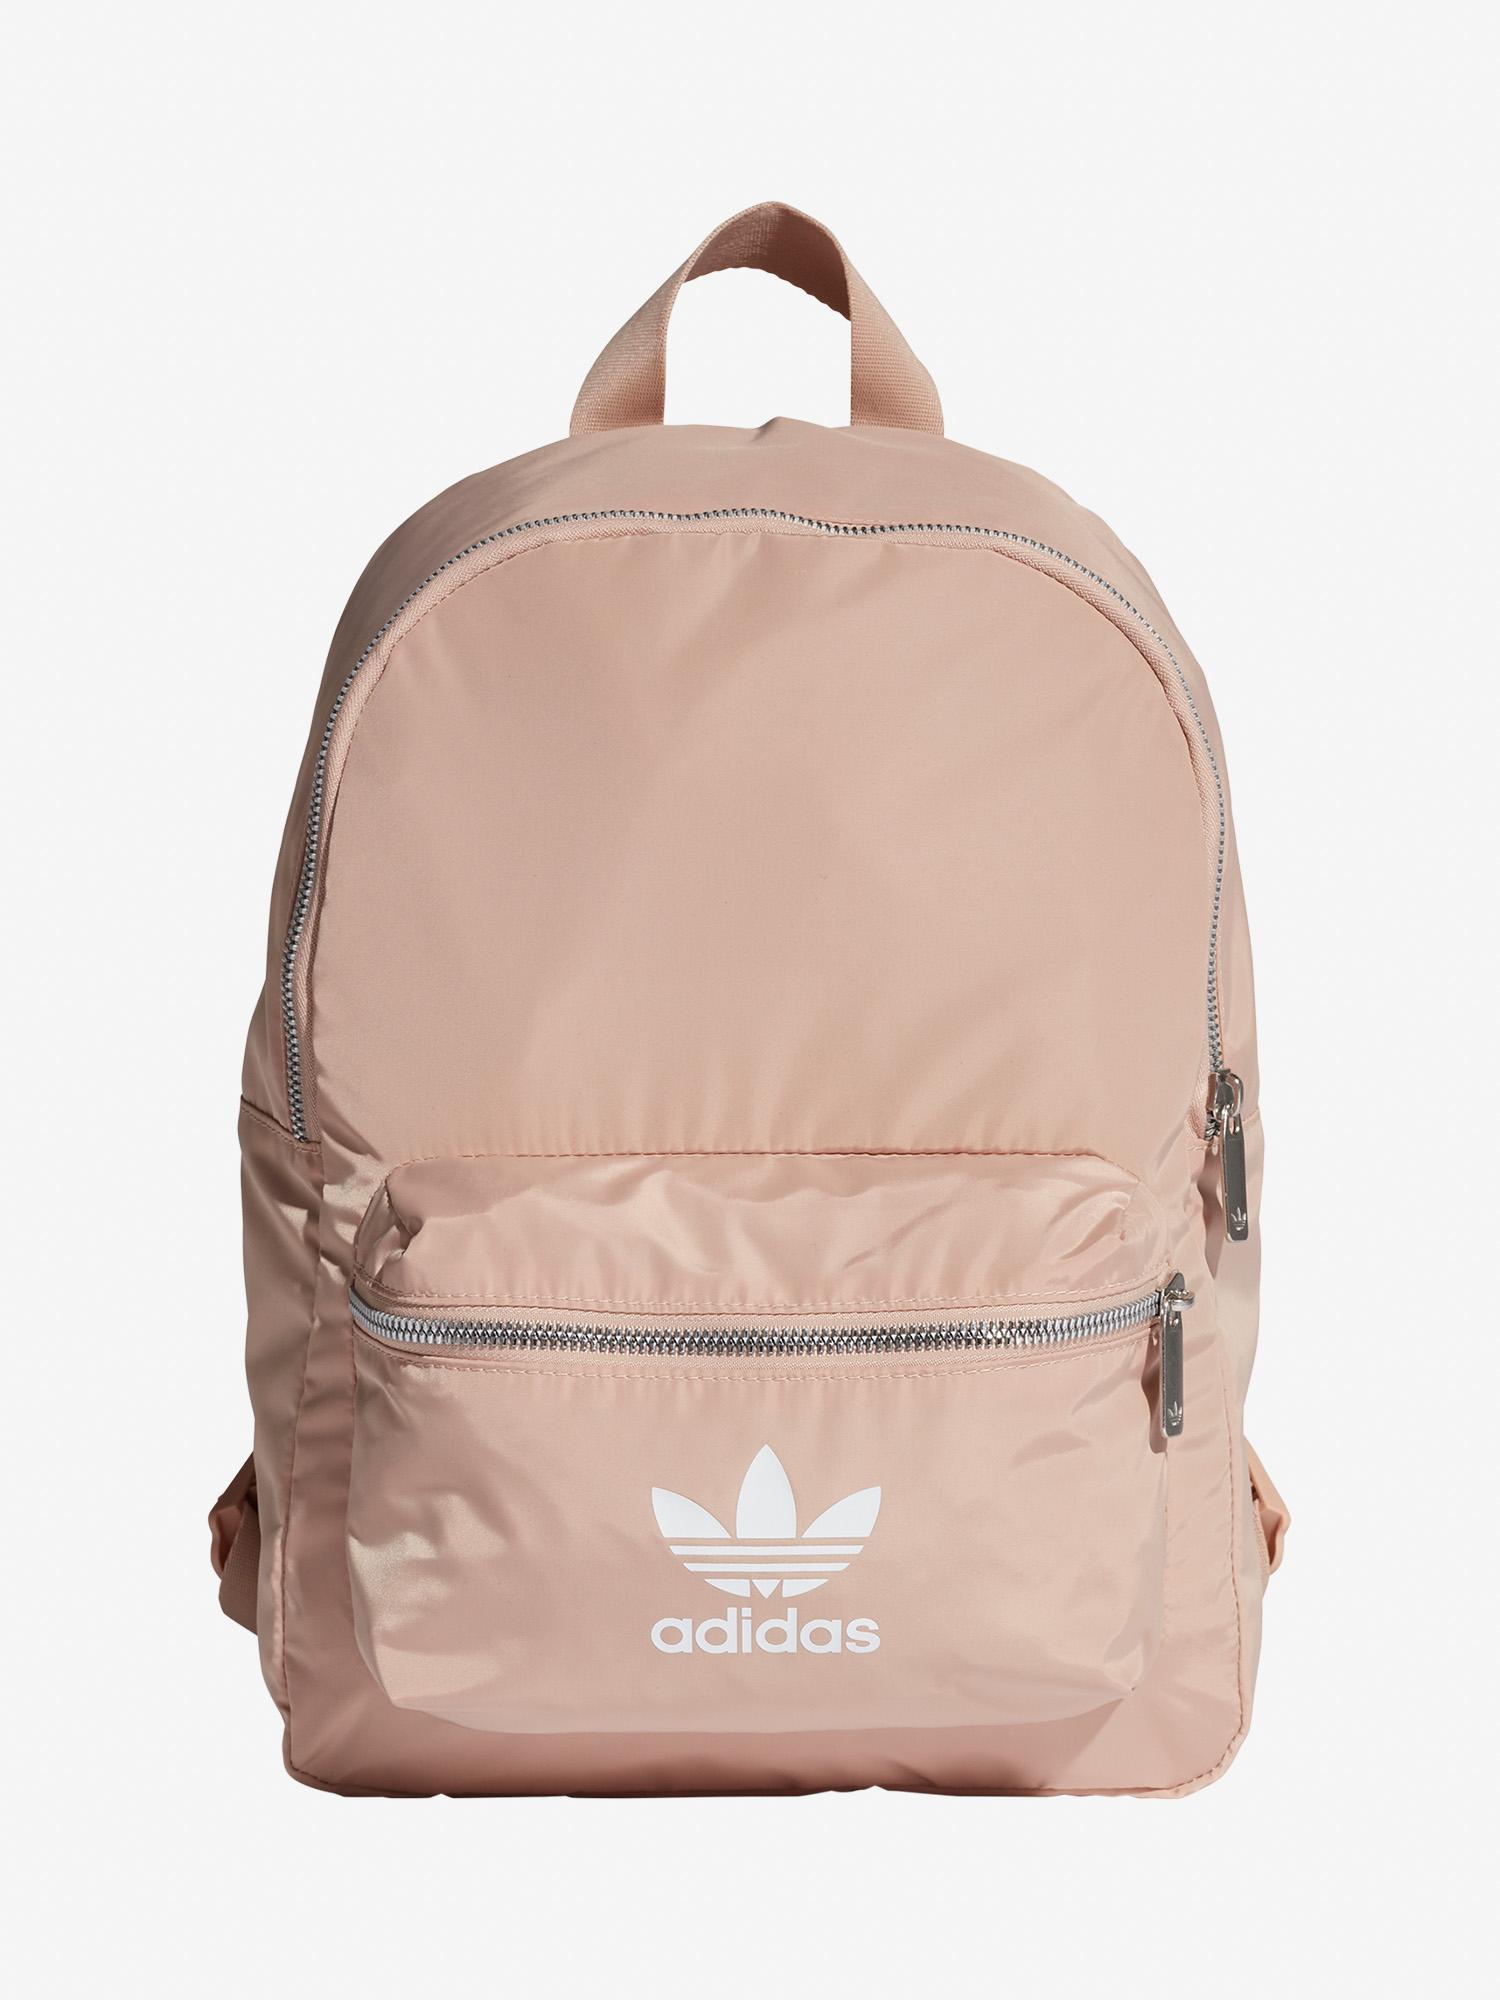 Adidas Originals Nylon W Bp Backpack